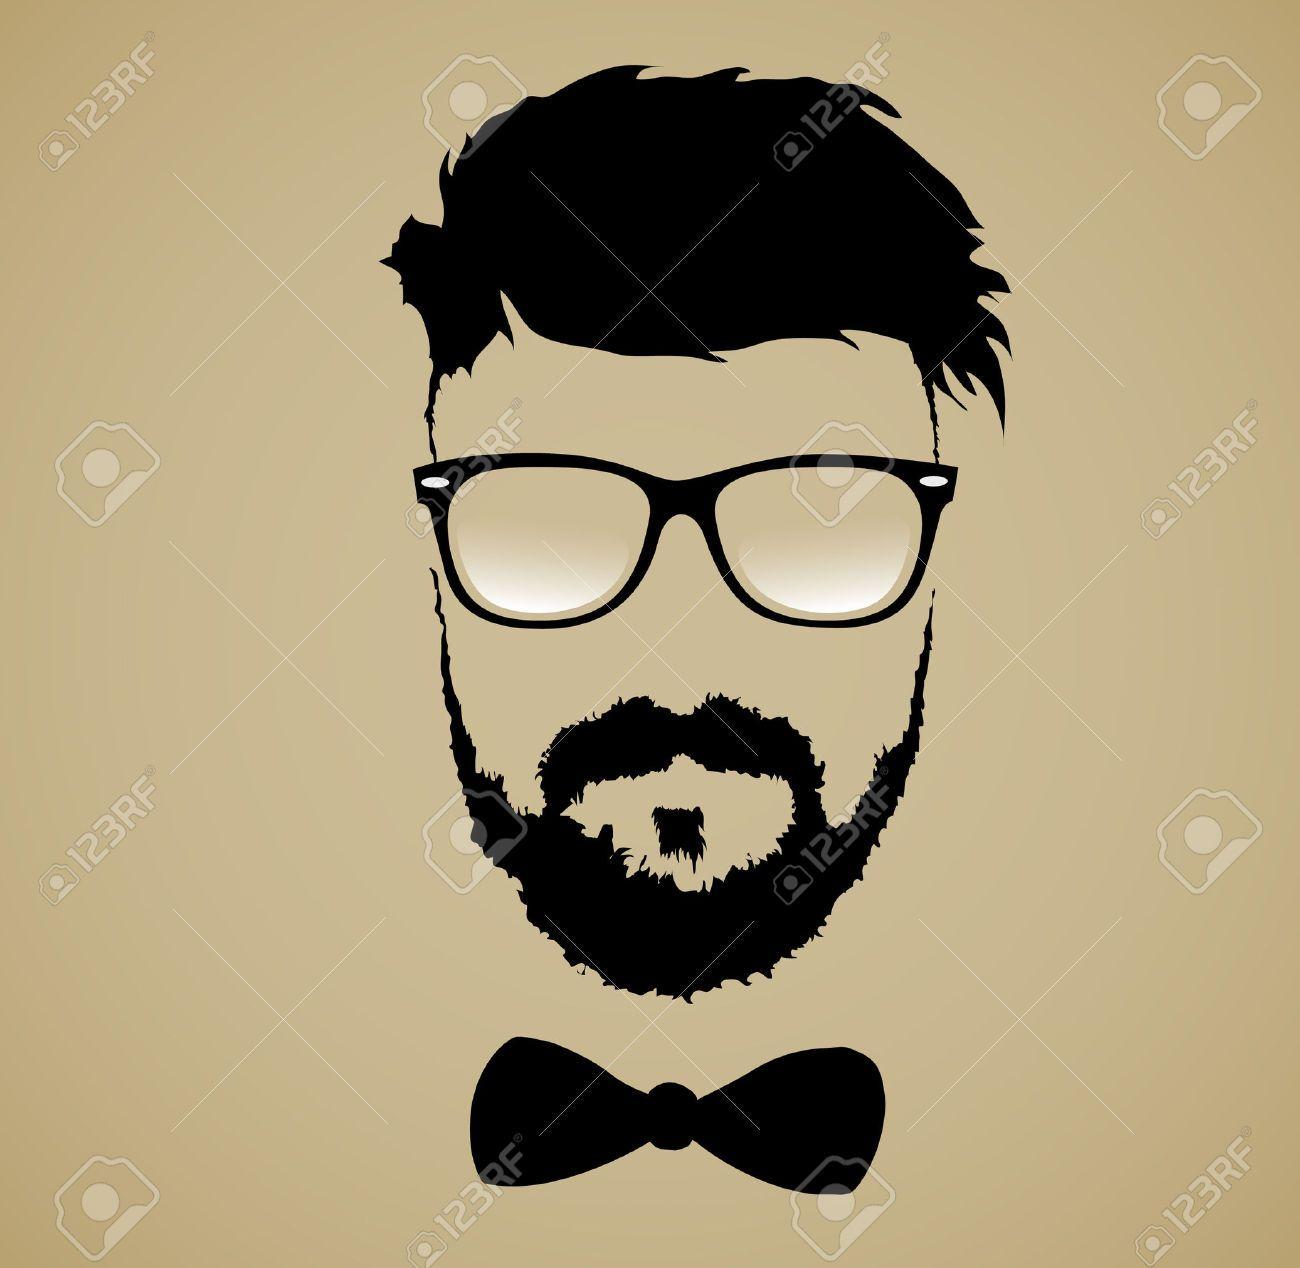 Clipart mustache man hair. Beard glasses hairstyle royalty